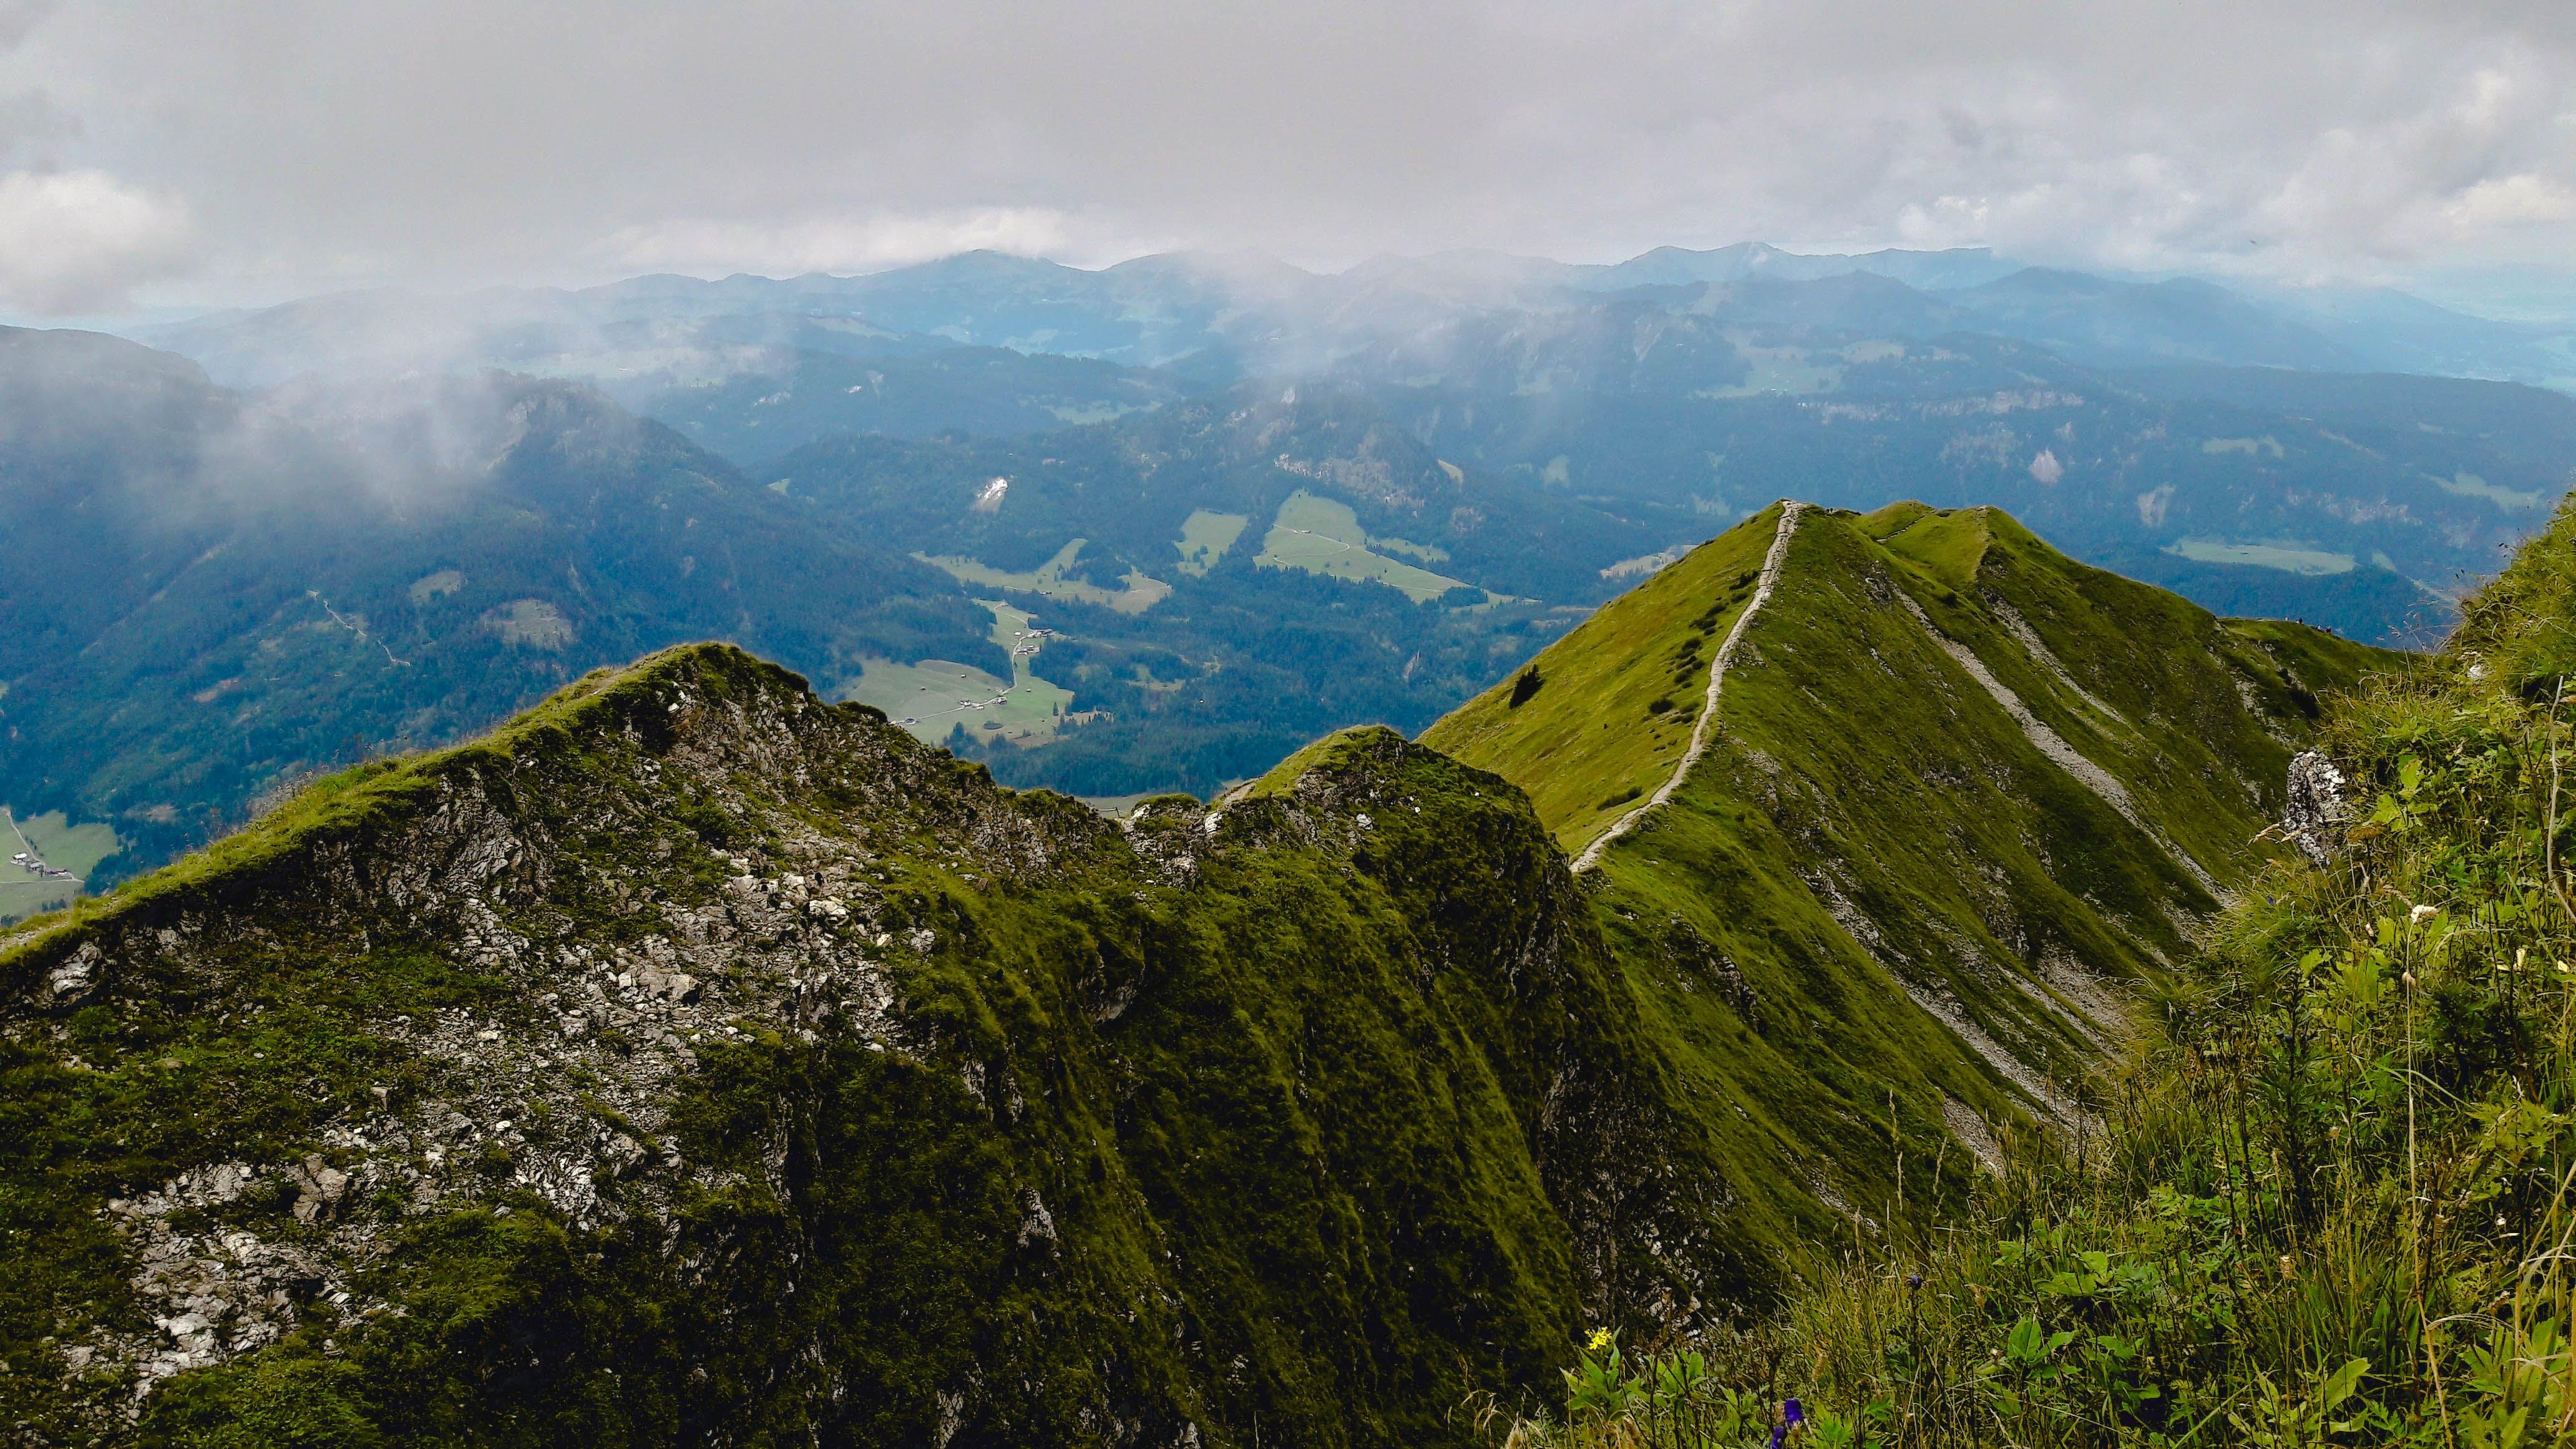 Kostenloses Stock Foto zu landschaft, berge, natur, himmel